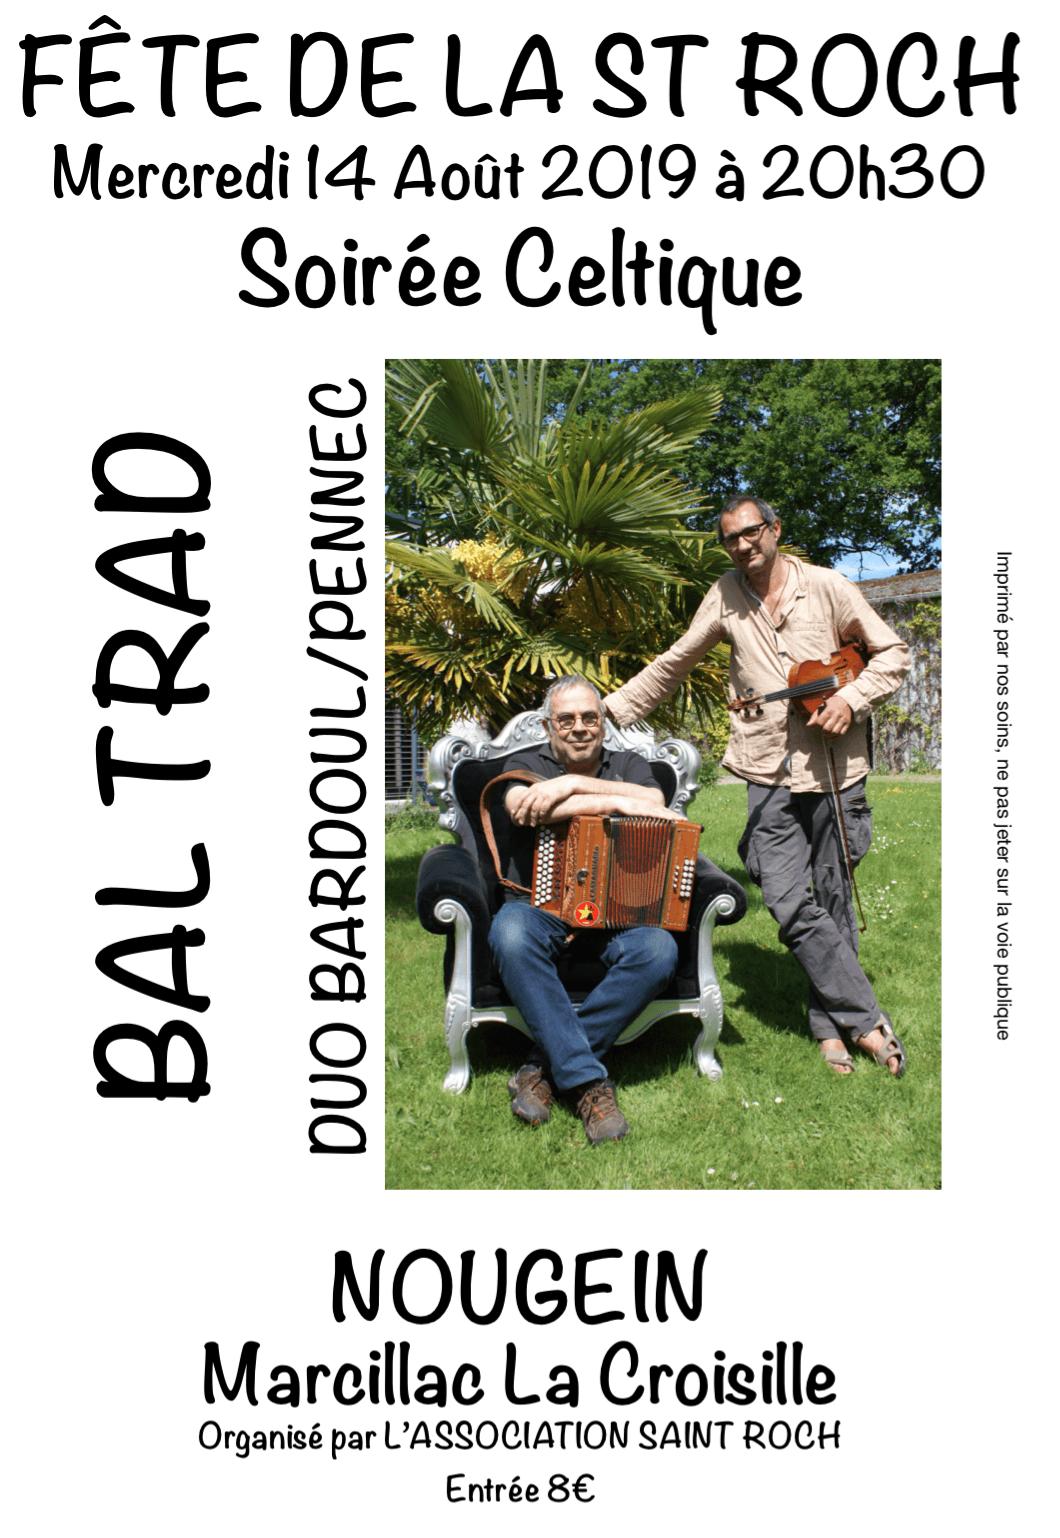 soiree-celtique-bal-trad_28028-compressor